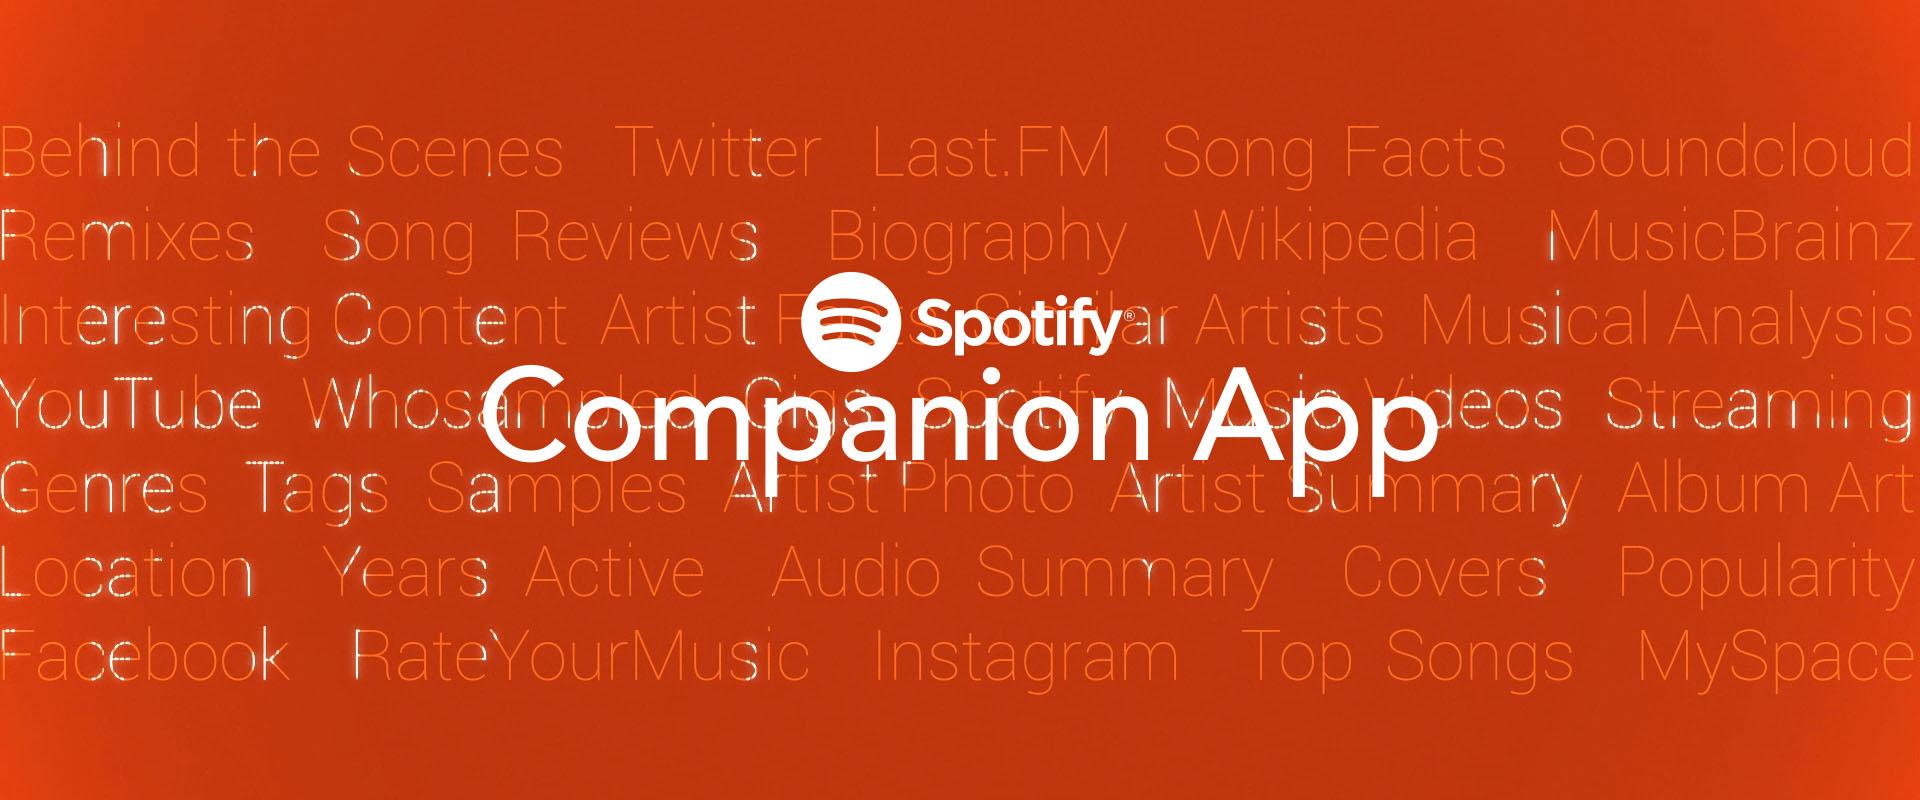 spotify companion app droptune thumbnail